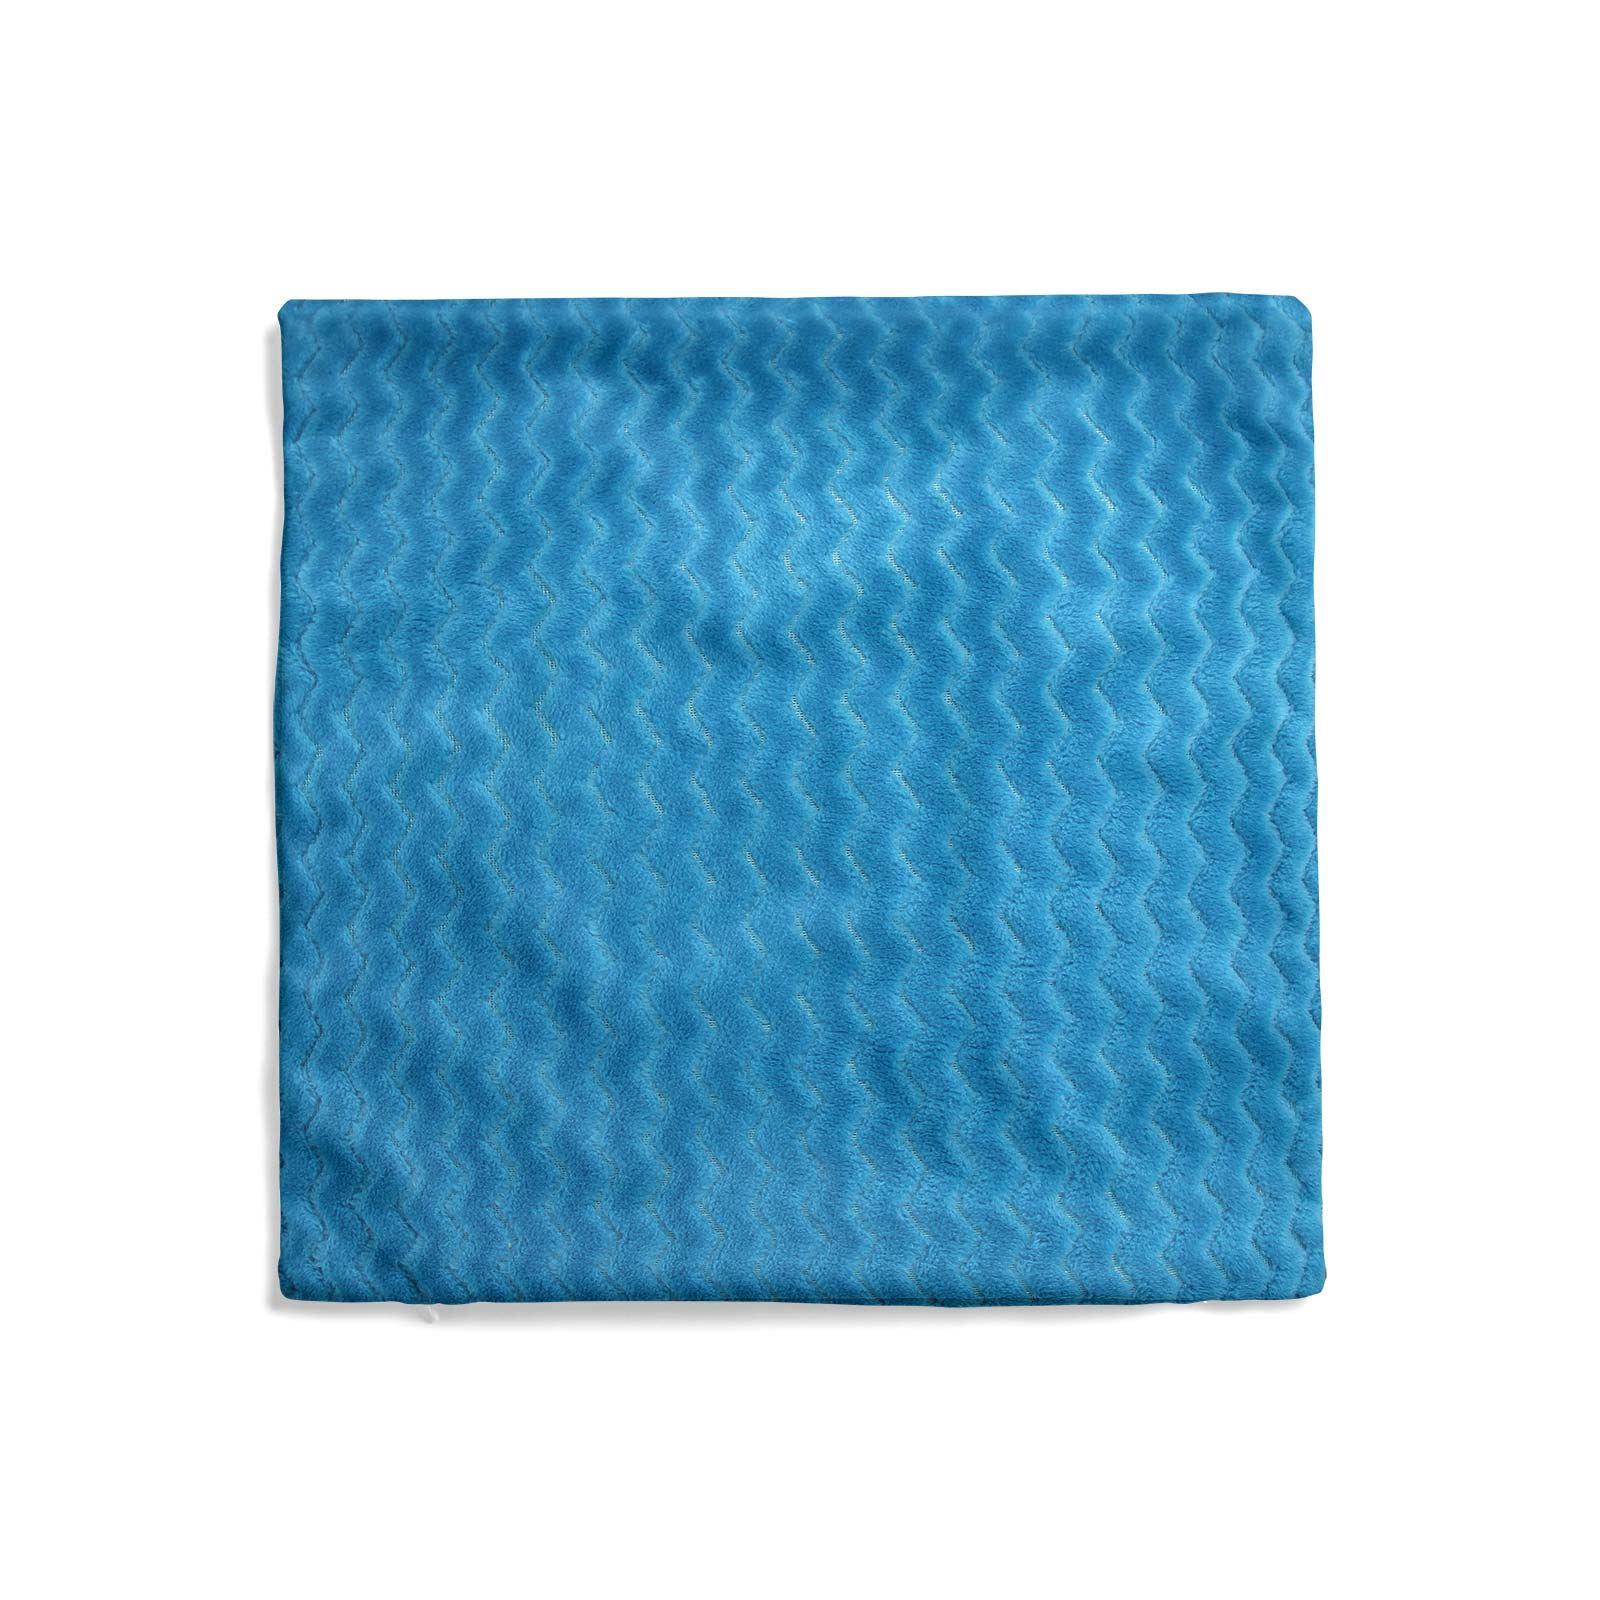 Teal-Blue-Duck-Egg-Cushion-Covers-18-034-x18-034-45cm-x-45cm-Luxury-Cover thumbnail 34